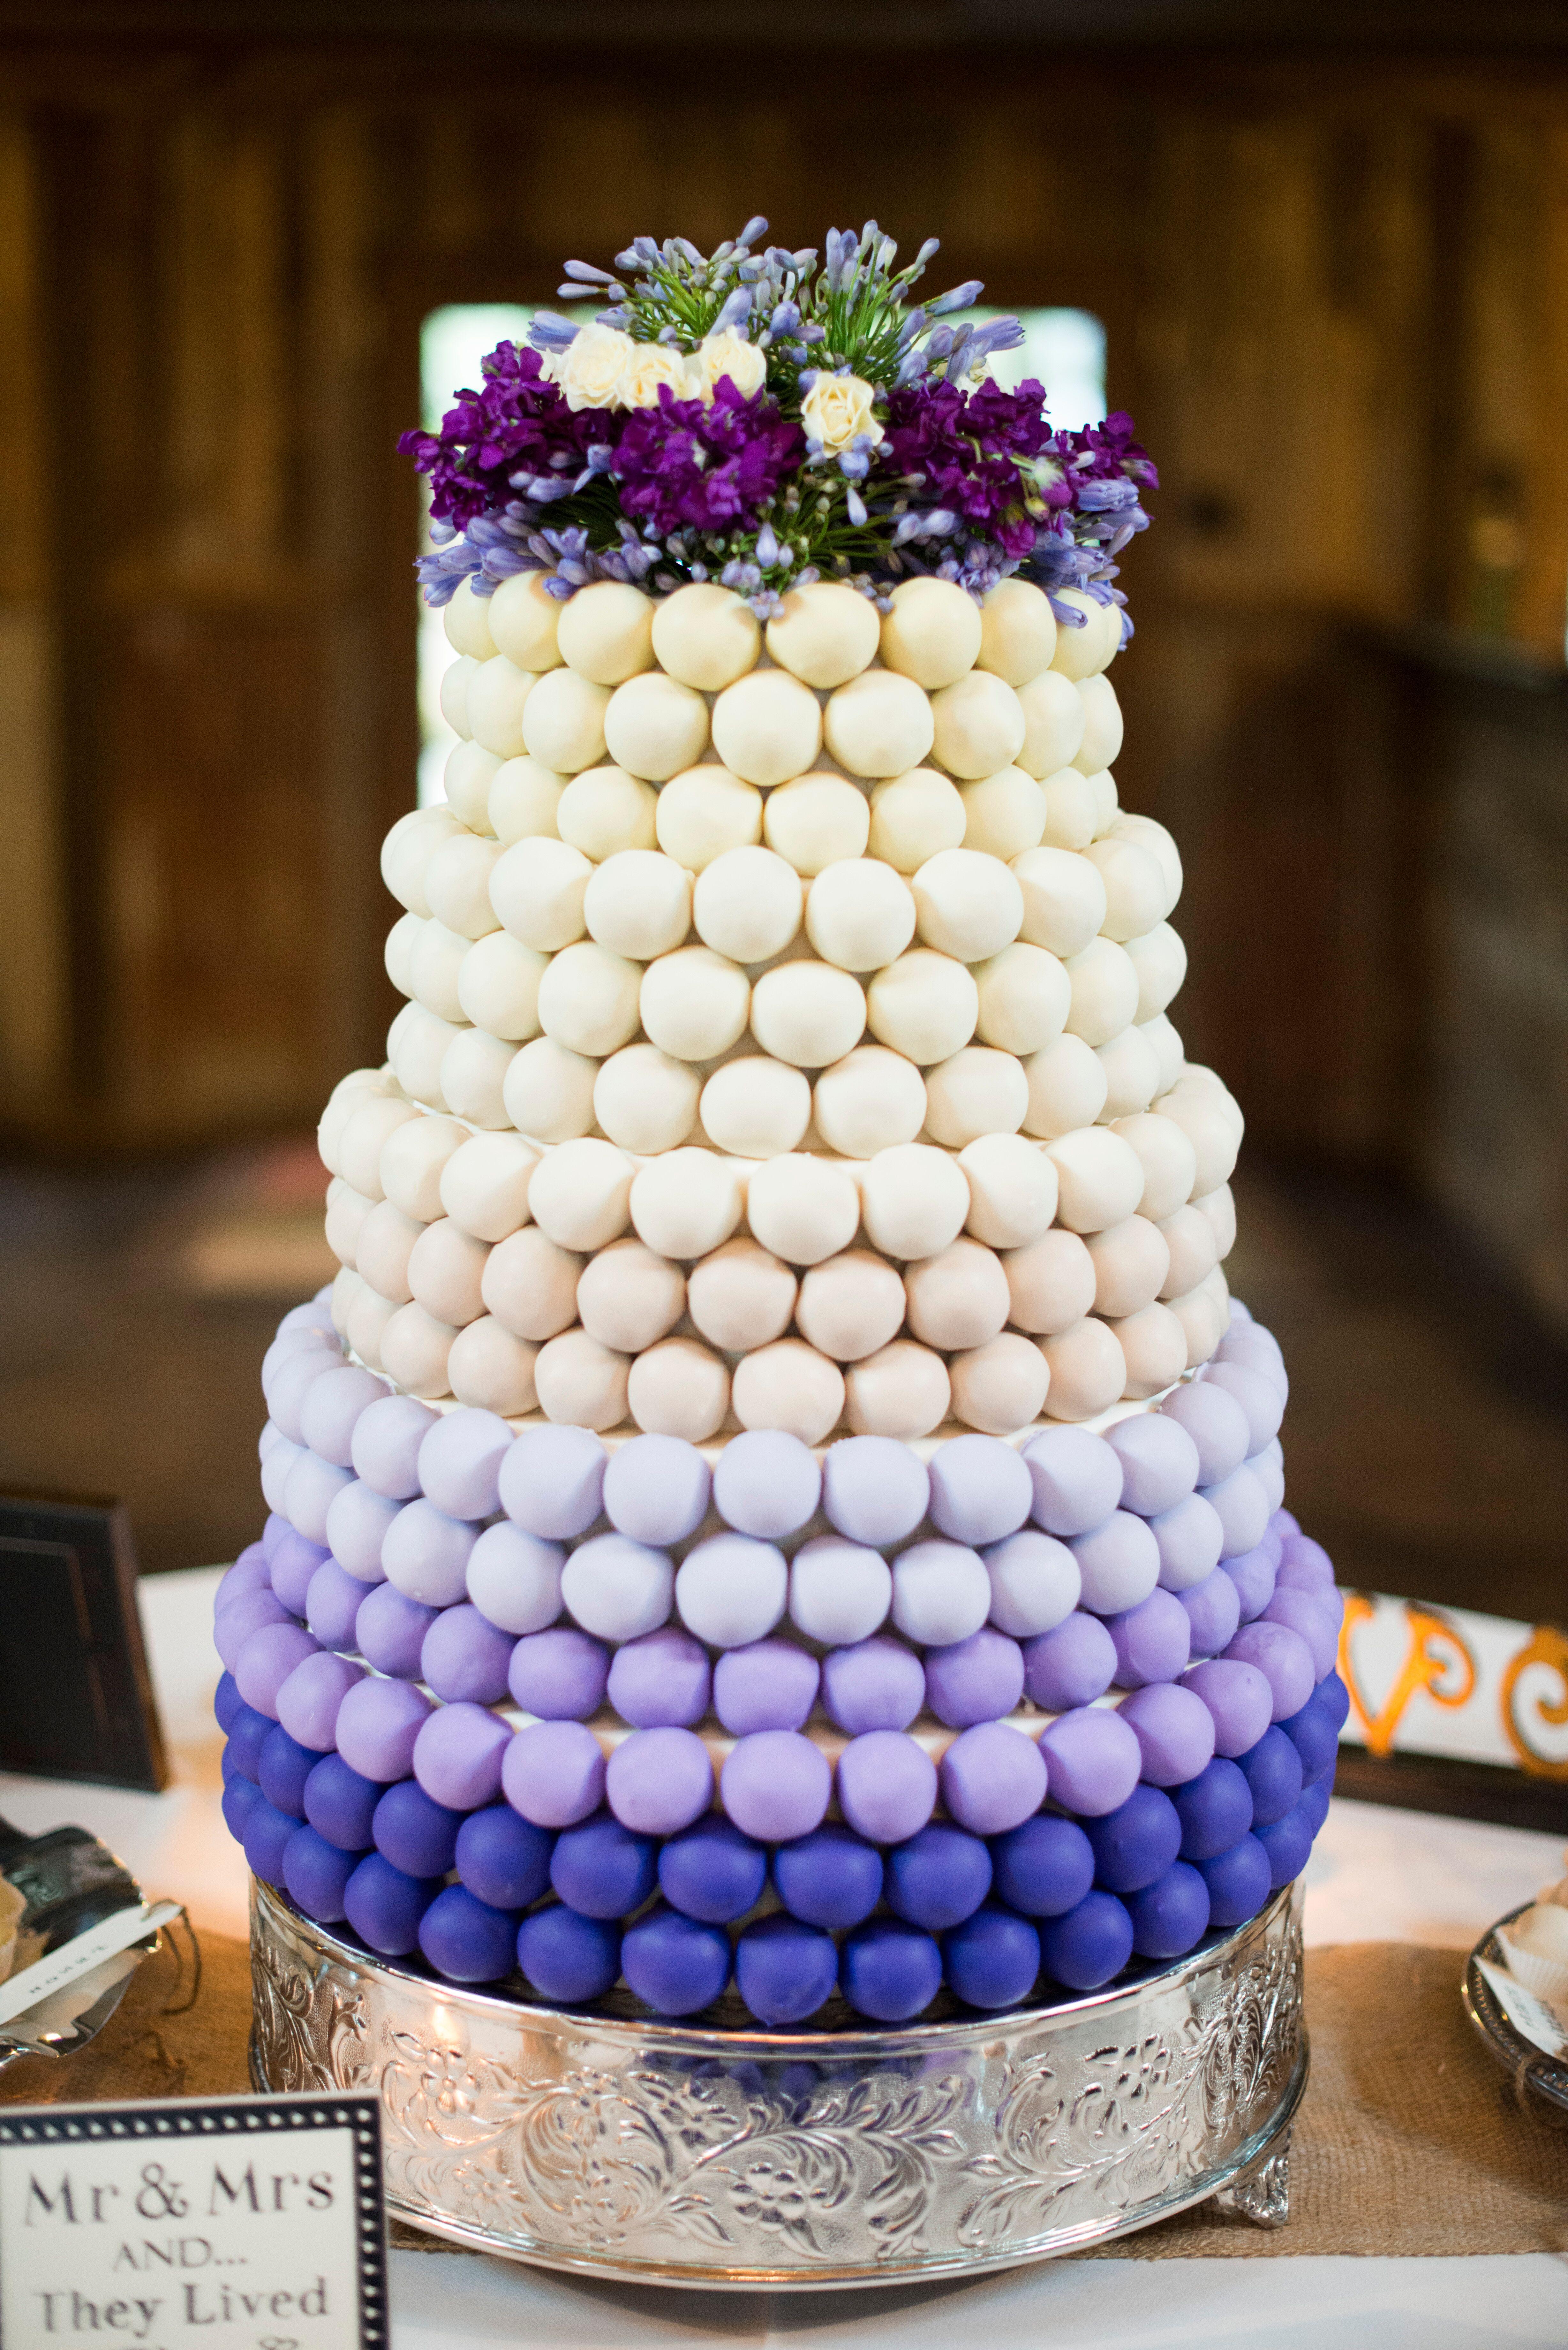 Wedding Cake Bakeries In Dallas TX The Knot - Wedding Cakes Dallas